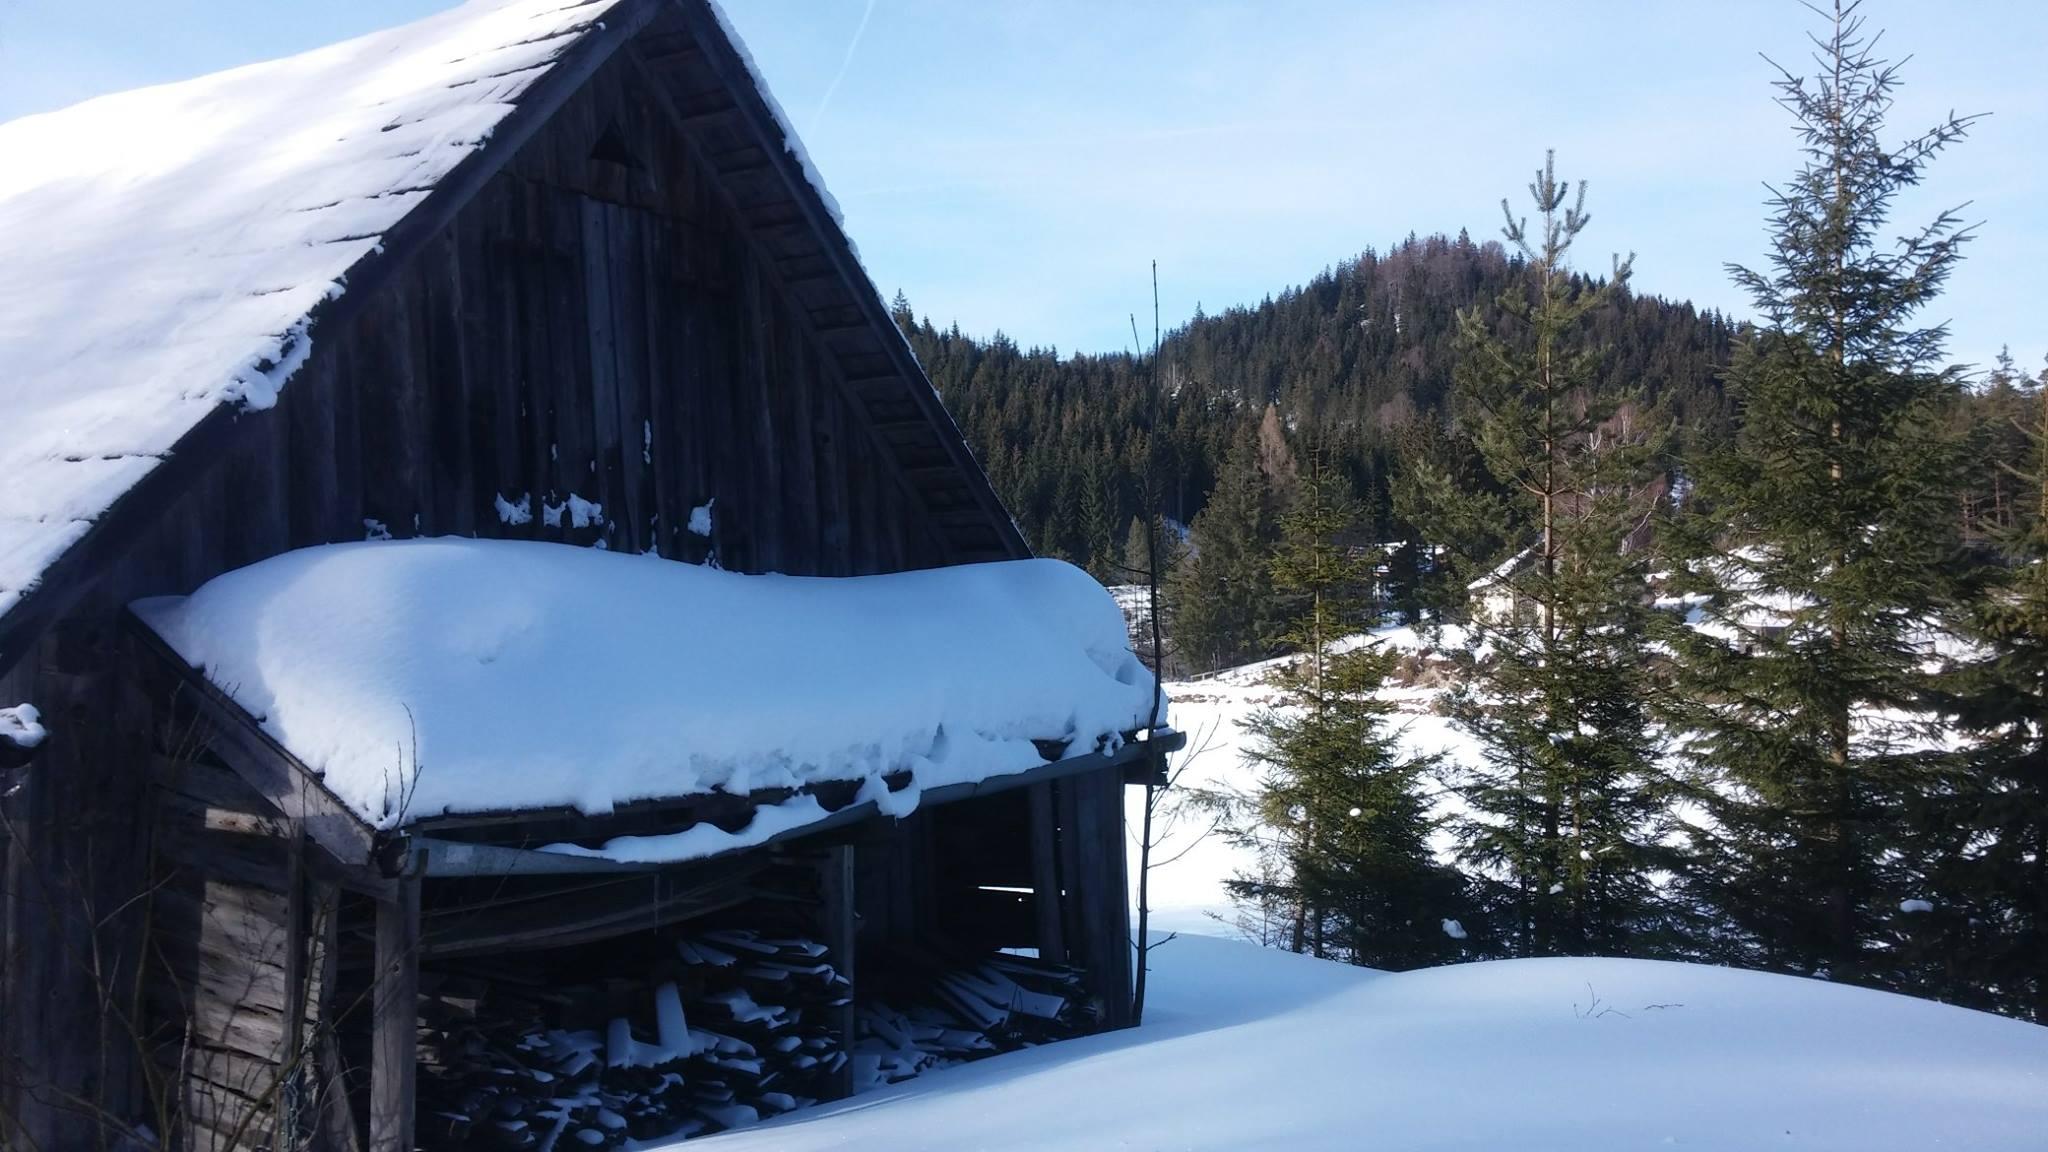 Hubertussee Hütte